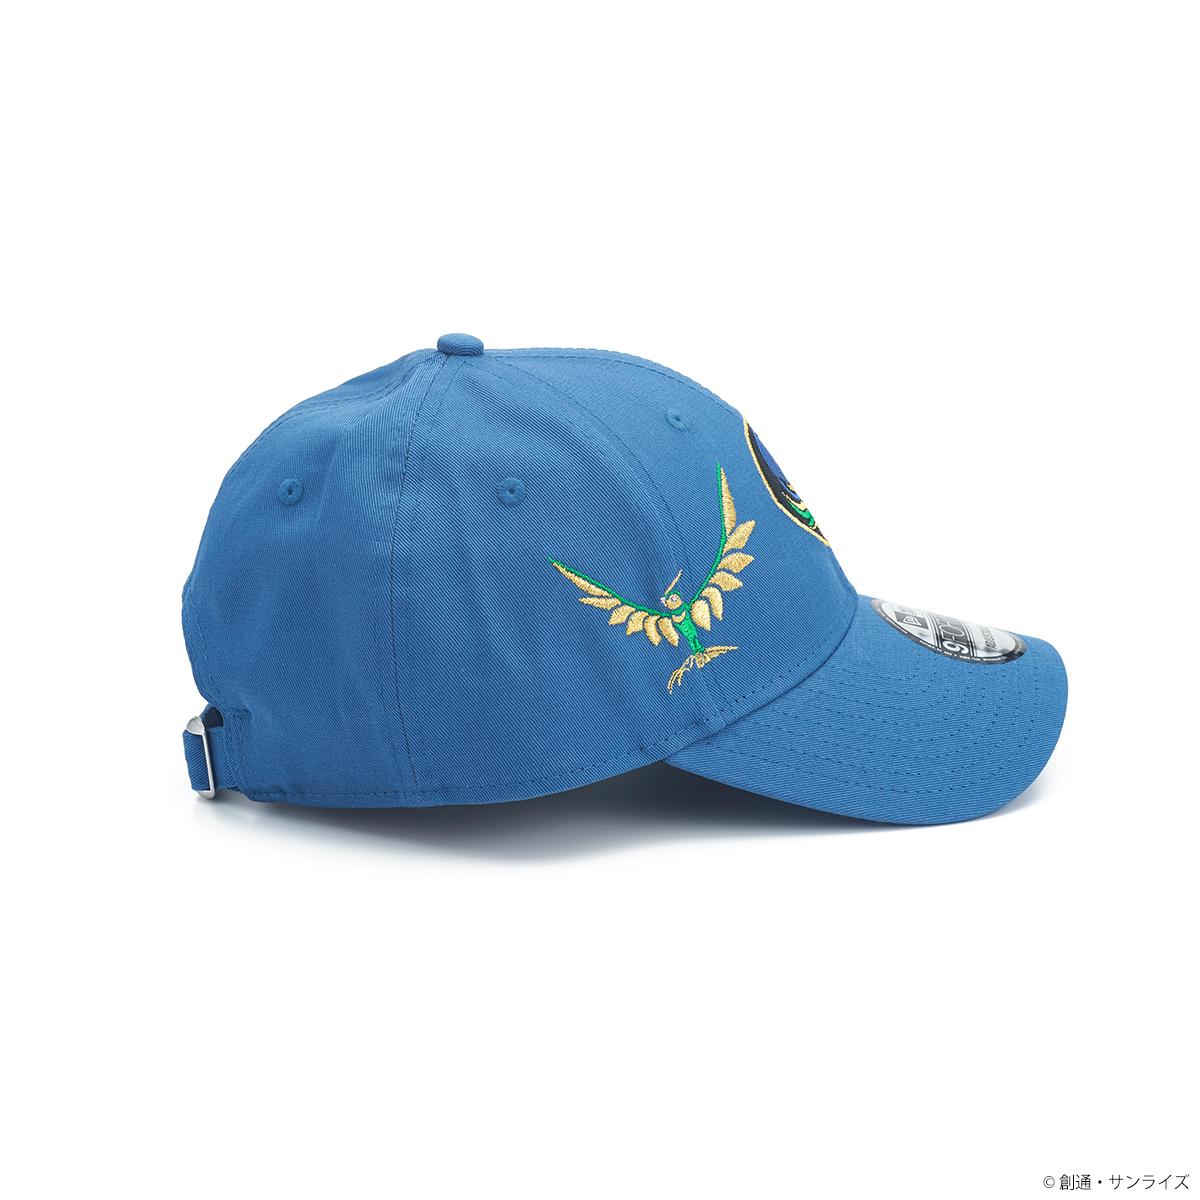 STRICT-G New Era 「機動戰士鋼彈SEED」 9FORTY棒球帽 地球聯合規格